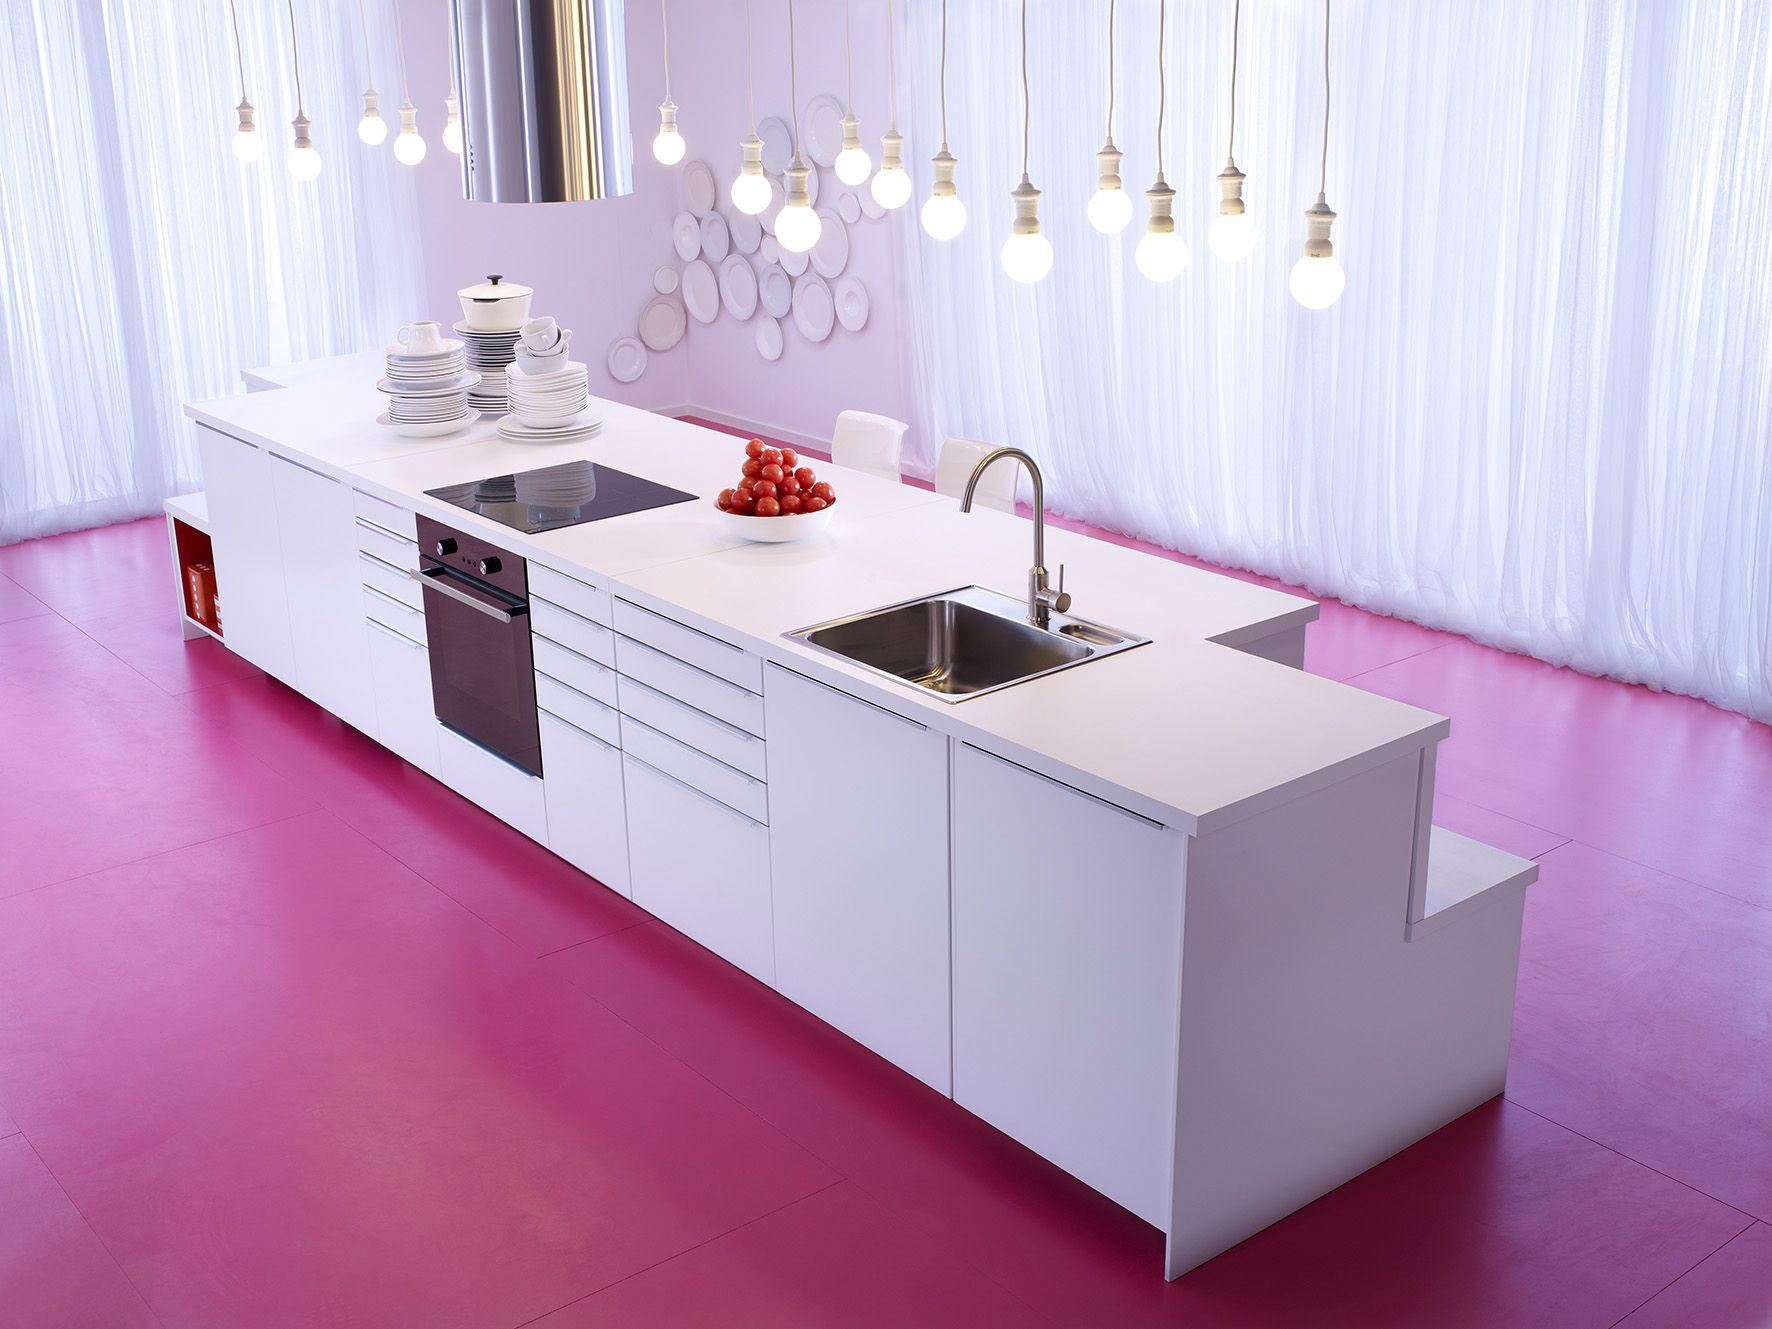 Nieuwe ikea keukens de metod keukensystemen wit kookeiland metod